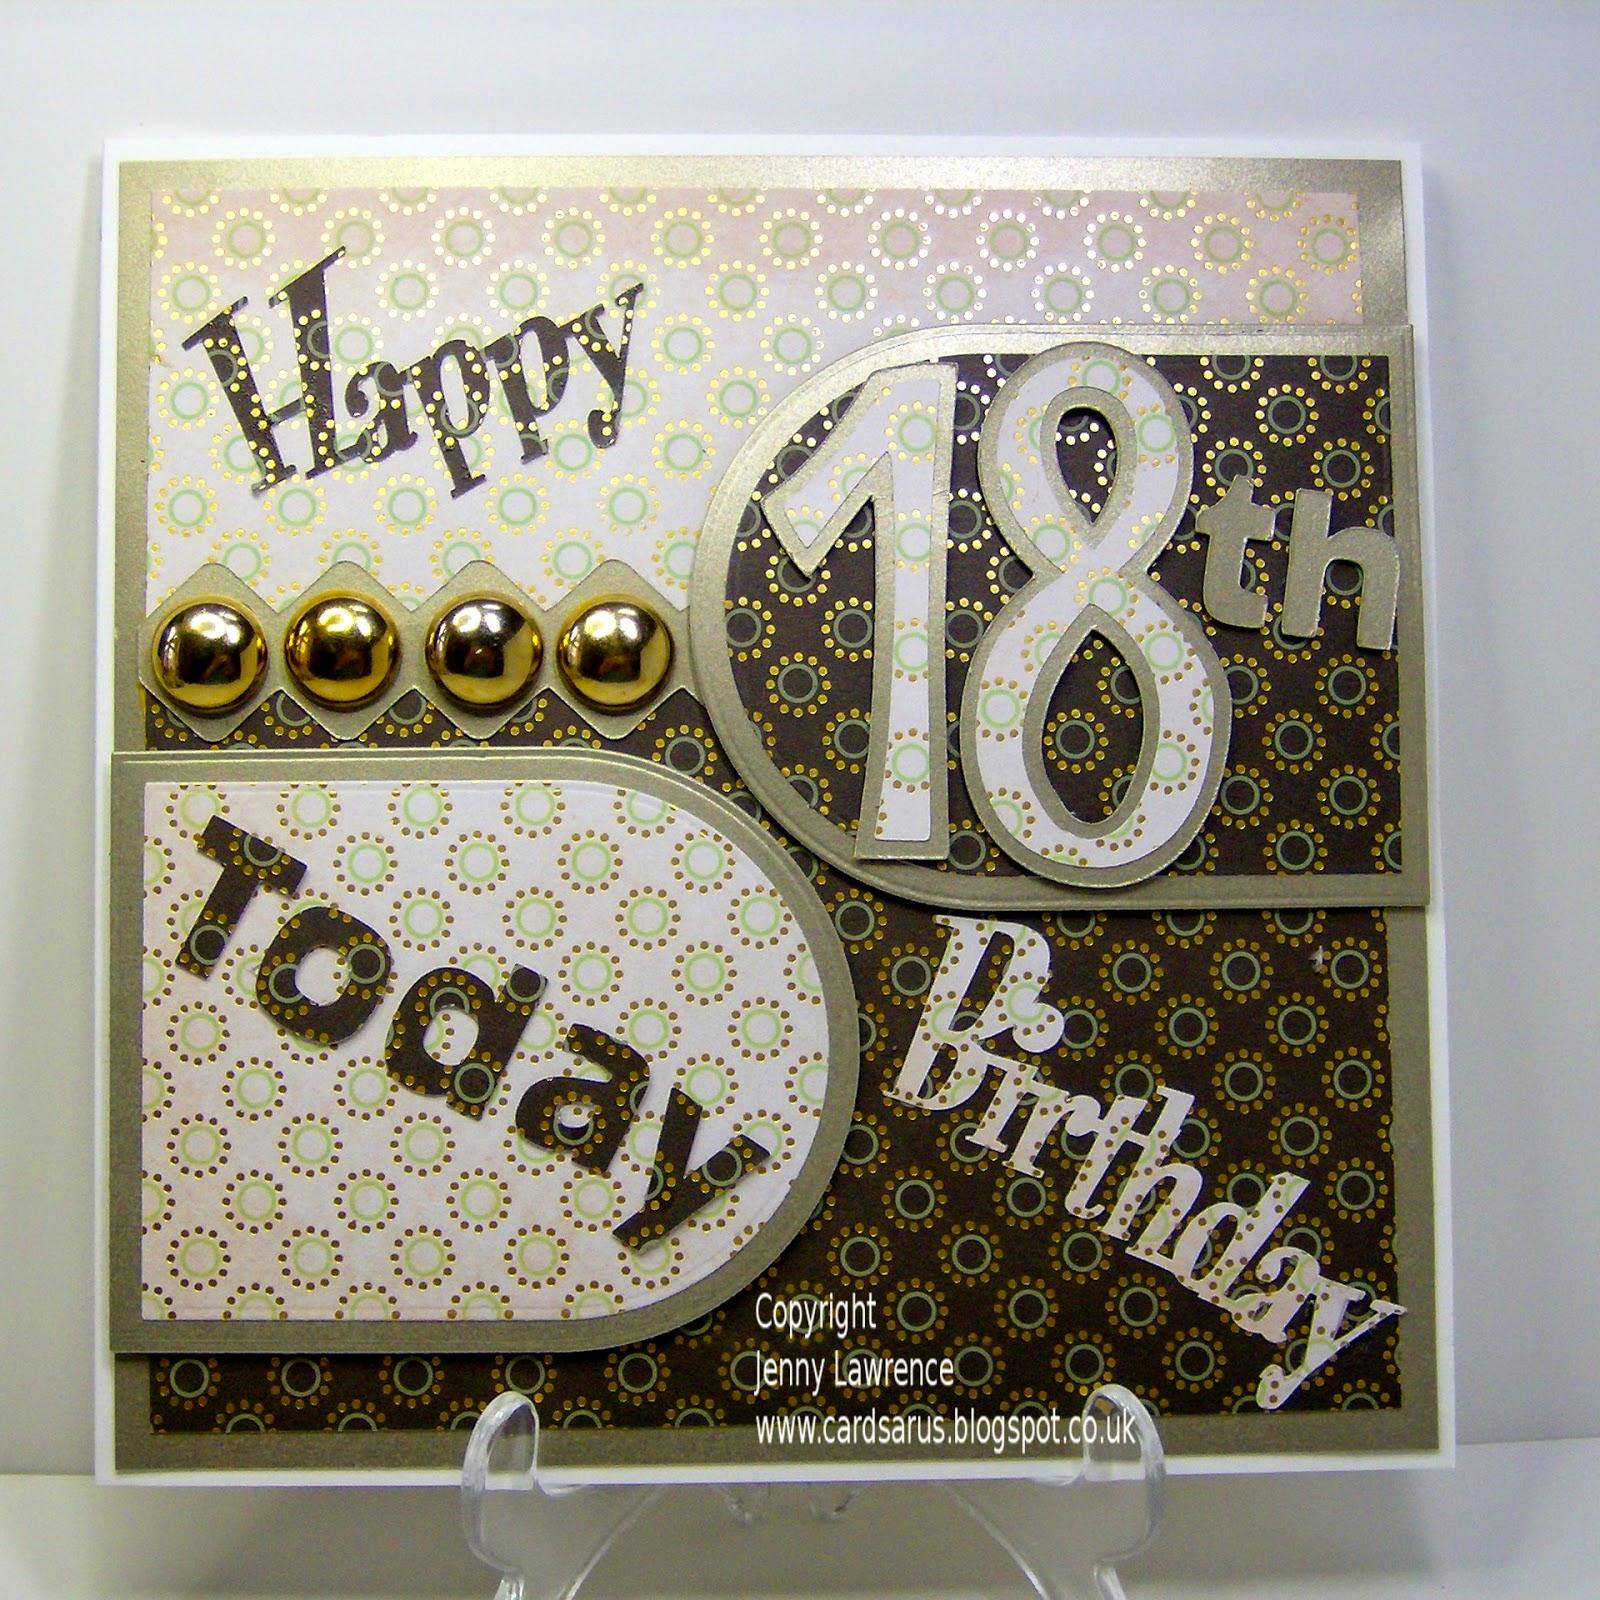 CARDSARUS: GRANDSON'S 18TH BIRTHDAY CARD